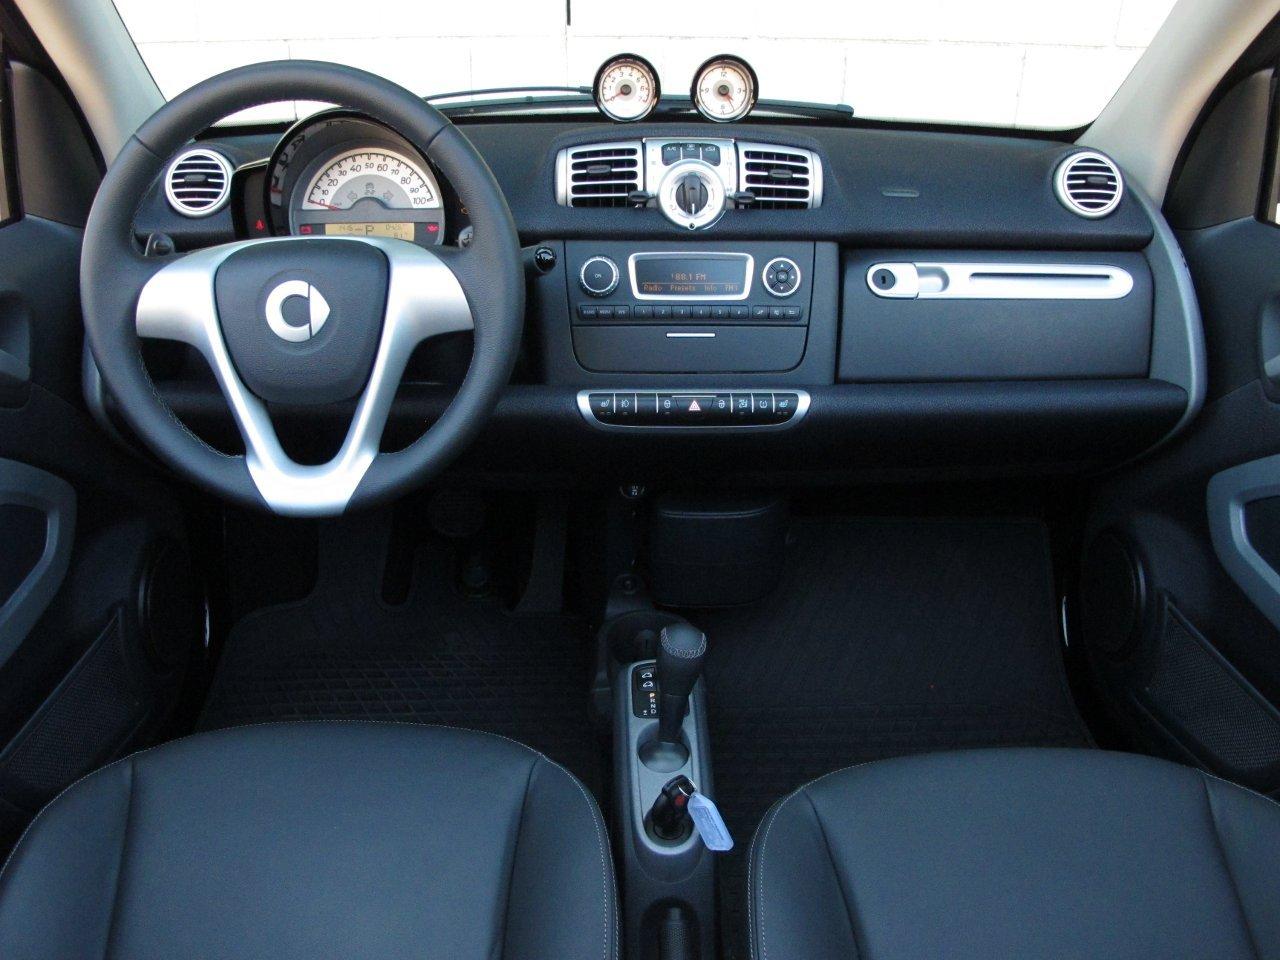 2011 smart fortwo cabriolet review automotive car. Black Bedroom Furniture Sets. Home Design Ideas